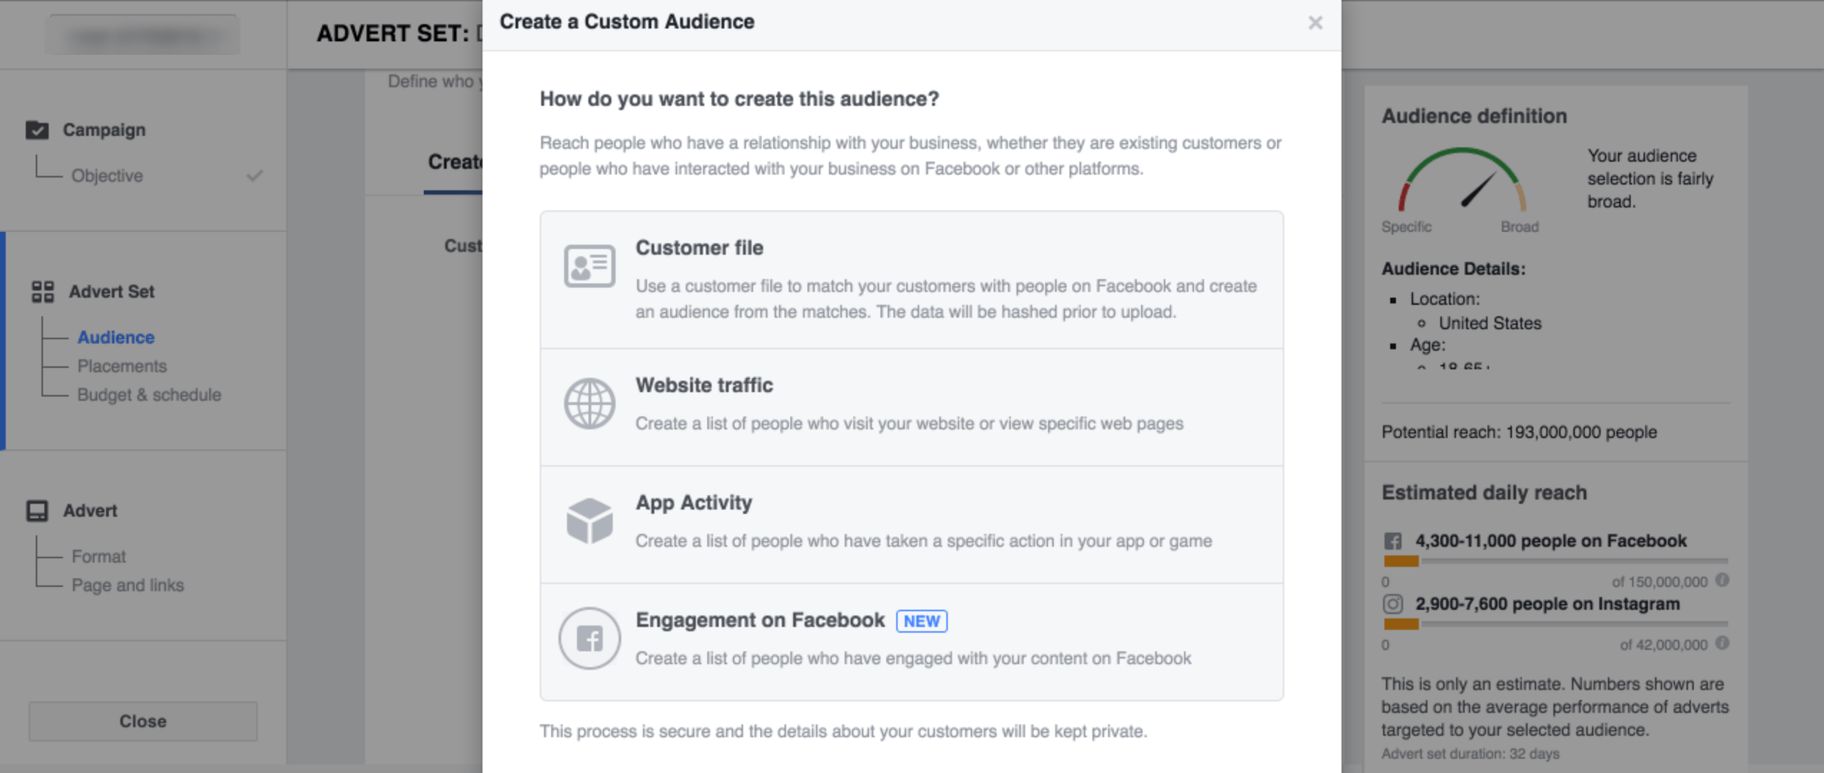 How to advertise on Instagram: custom audience